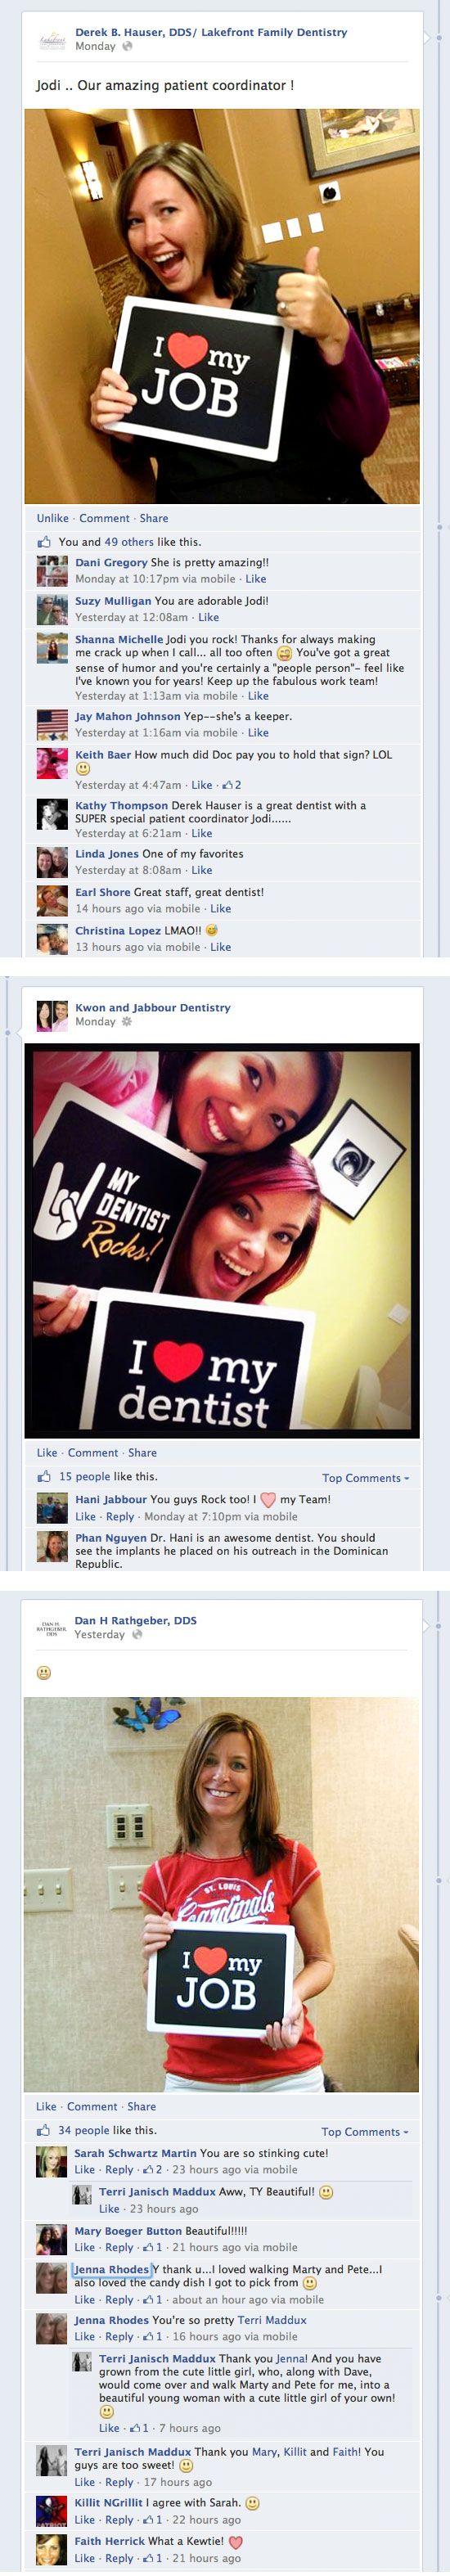 Social Signs Provide Fun Social Media For Dentists! (download printable PDF below) - My Social Practice - Social Media Marketing For Dentists, Orthodontists, & Optometrists